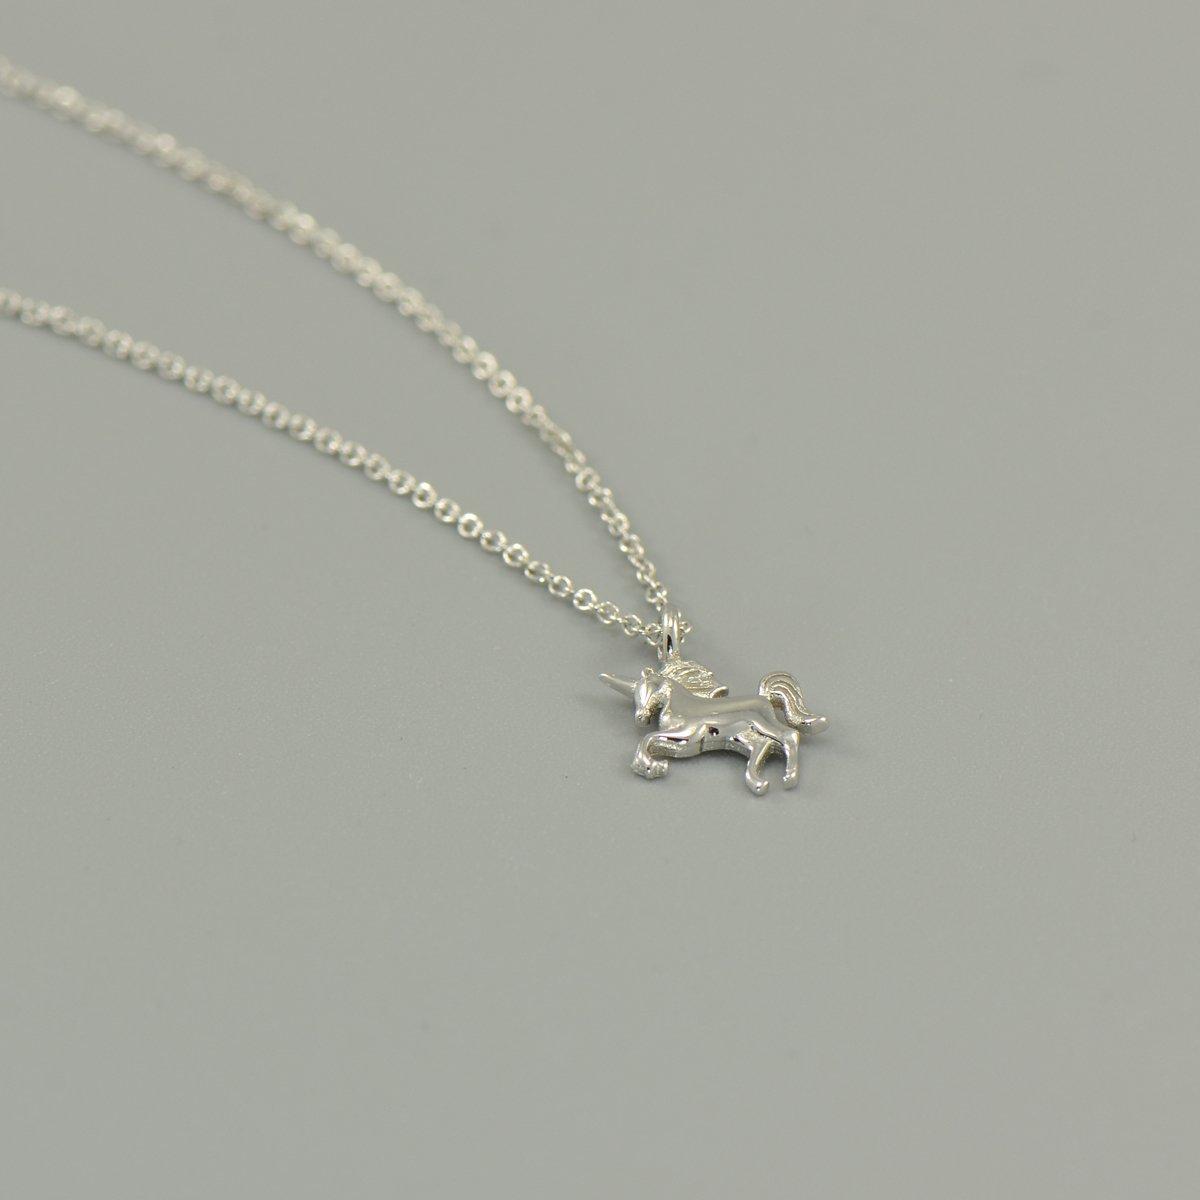 925 Sterling Silver Tiny Unicorn Charm Pendant Necklace 16